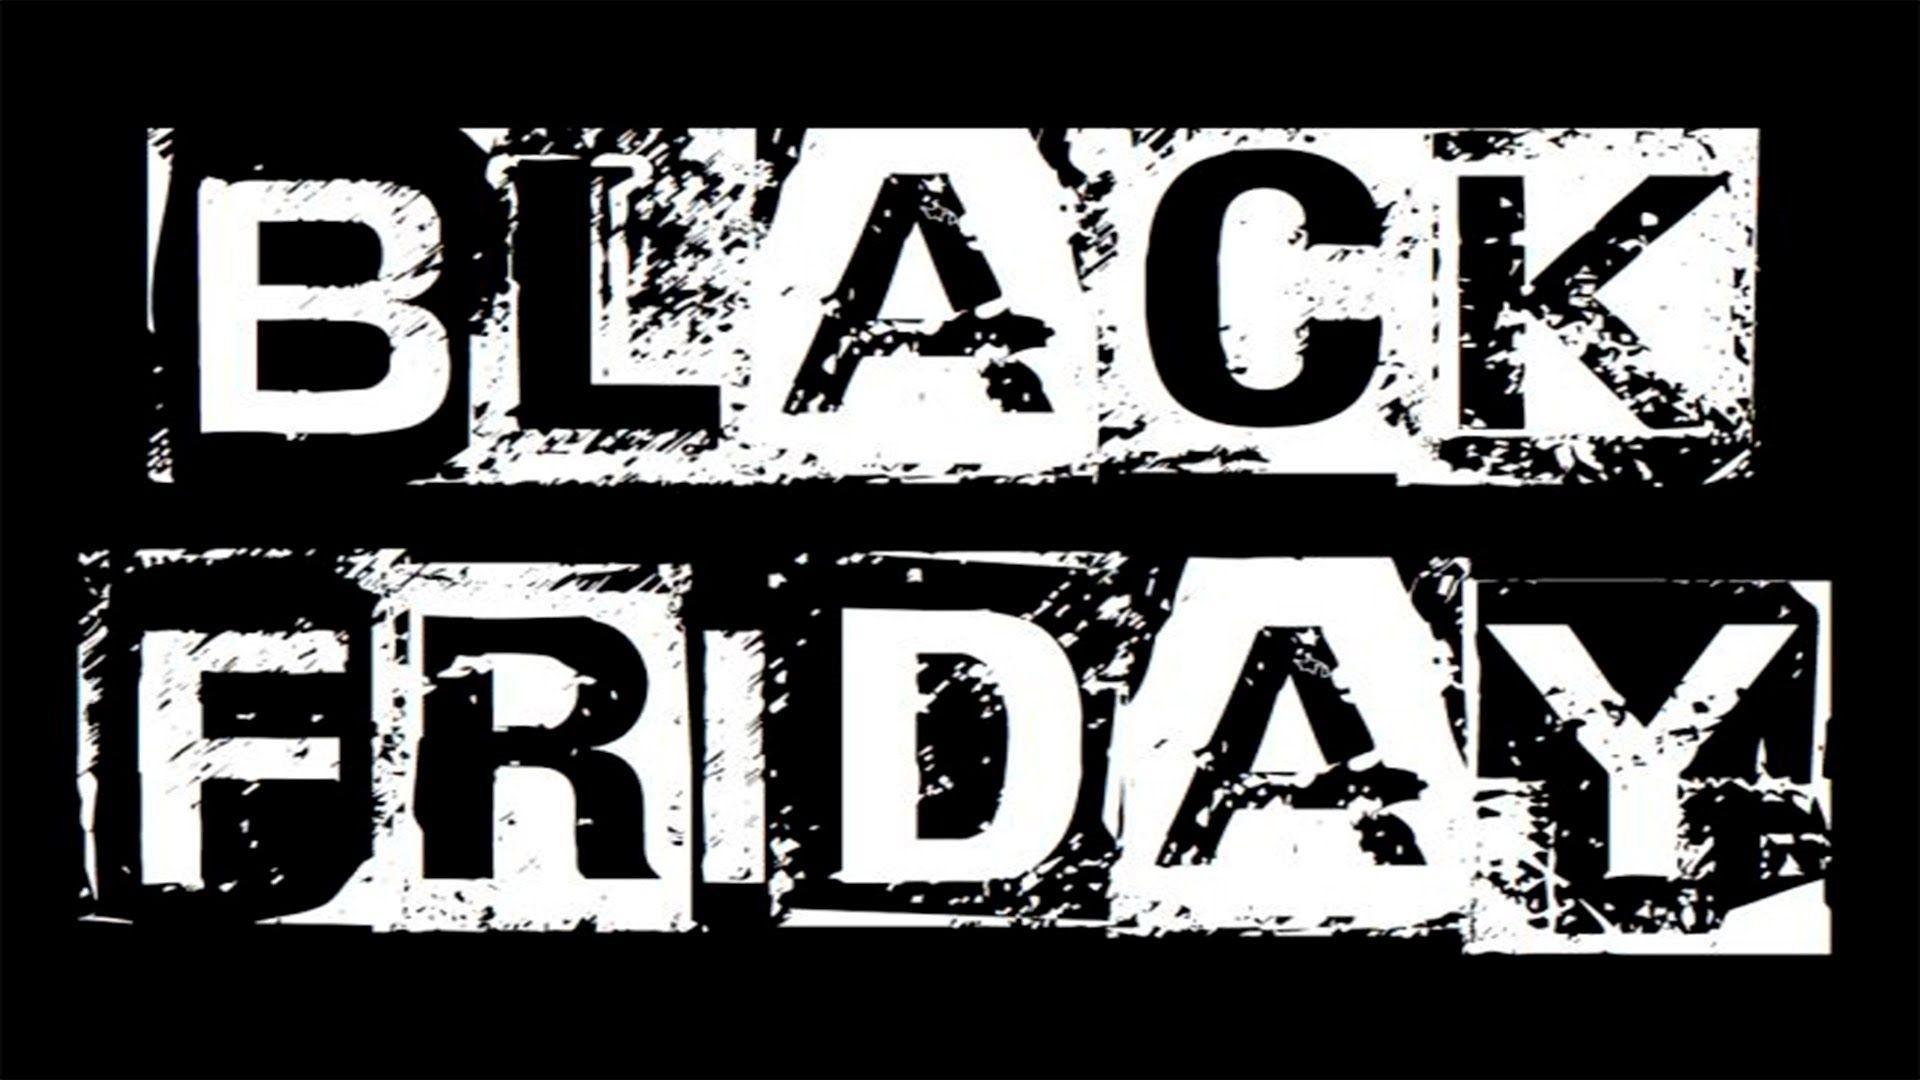 Black Friday wallpaper photo hd